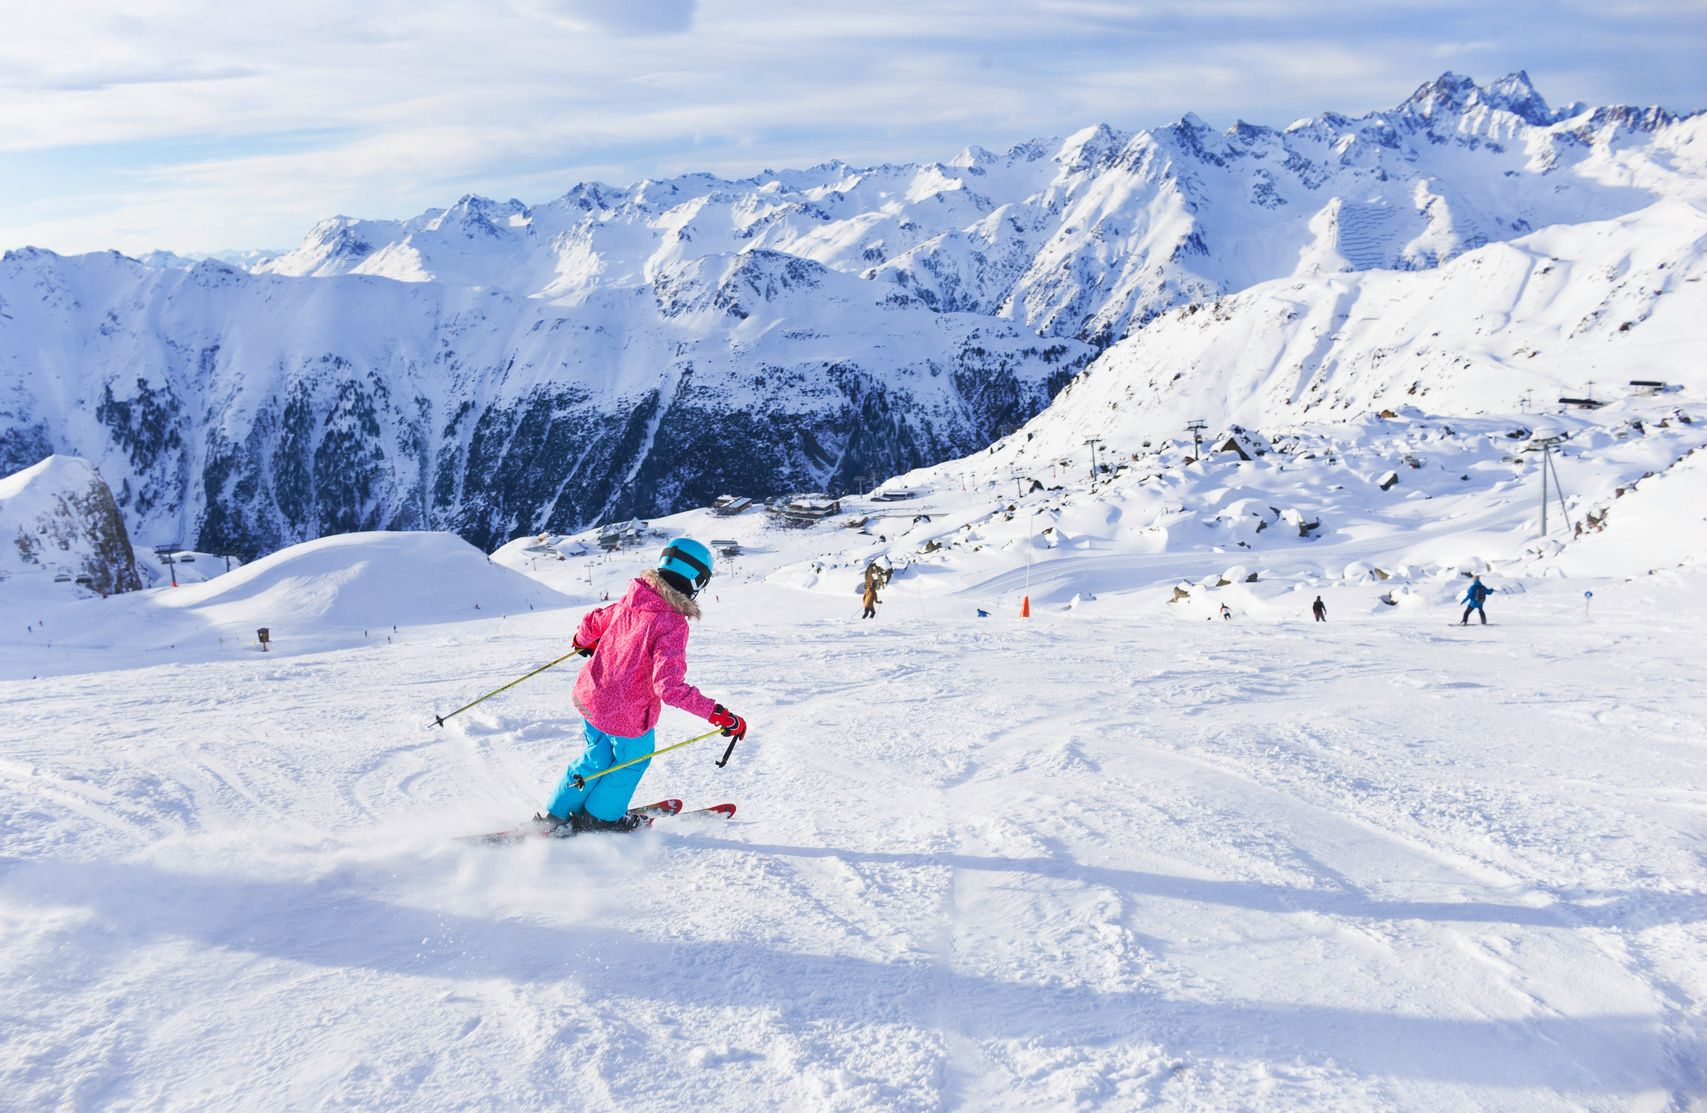 Ski Resort Near Osaka Day Trip To Hachi Kita Kogen Ski Resort Best Family Ski Resorts Best Ski Resorts